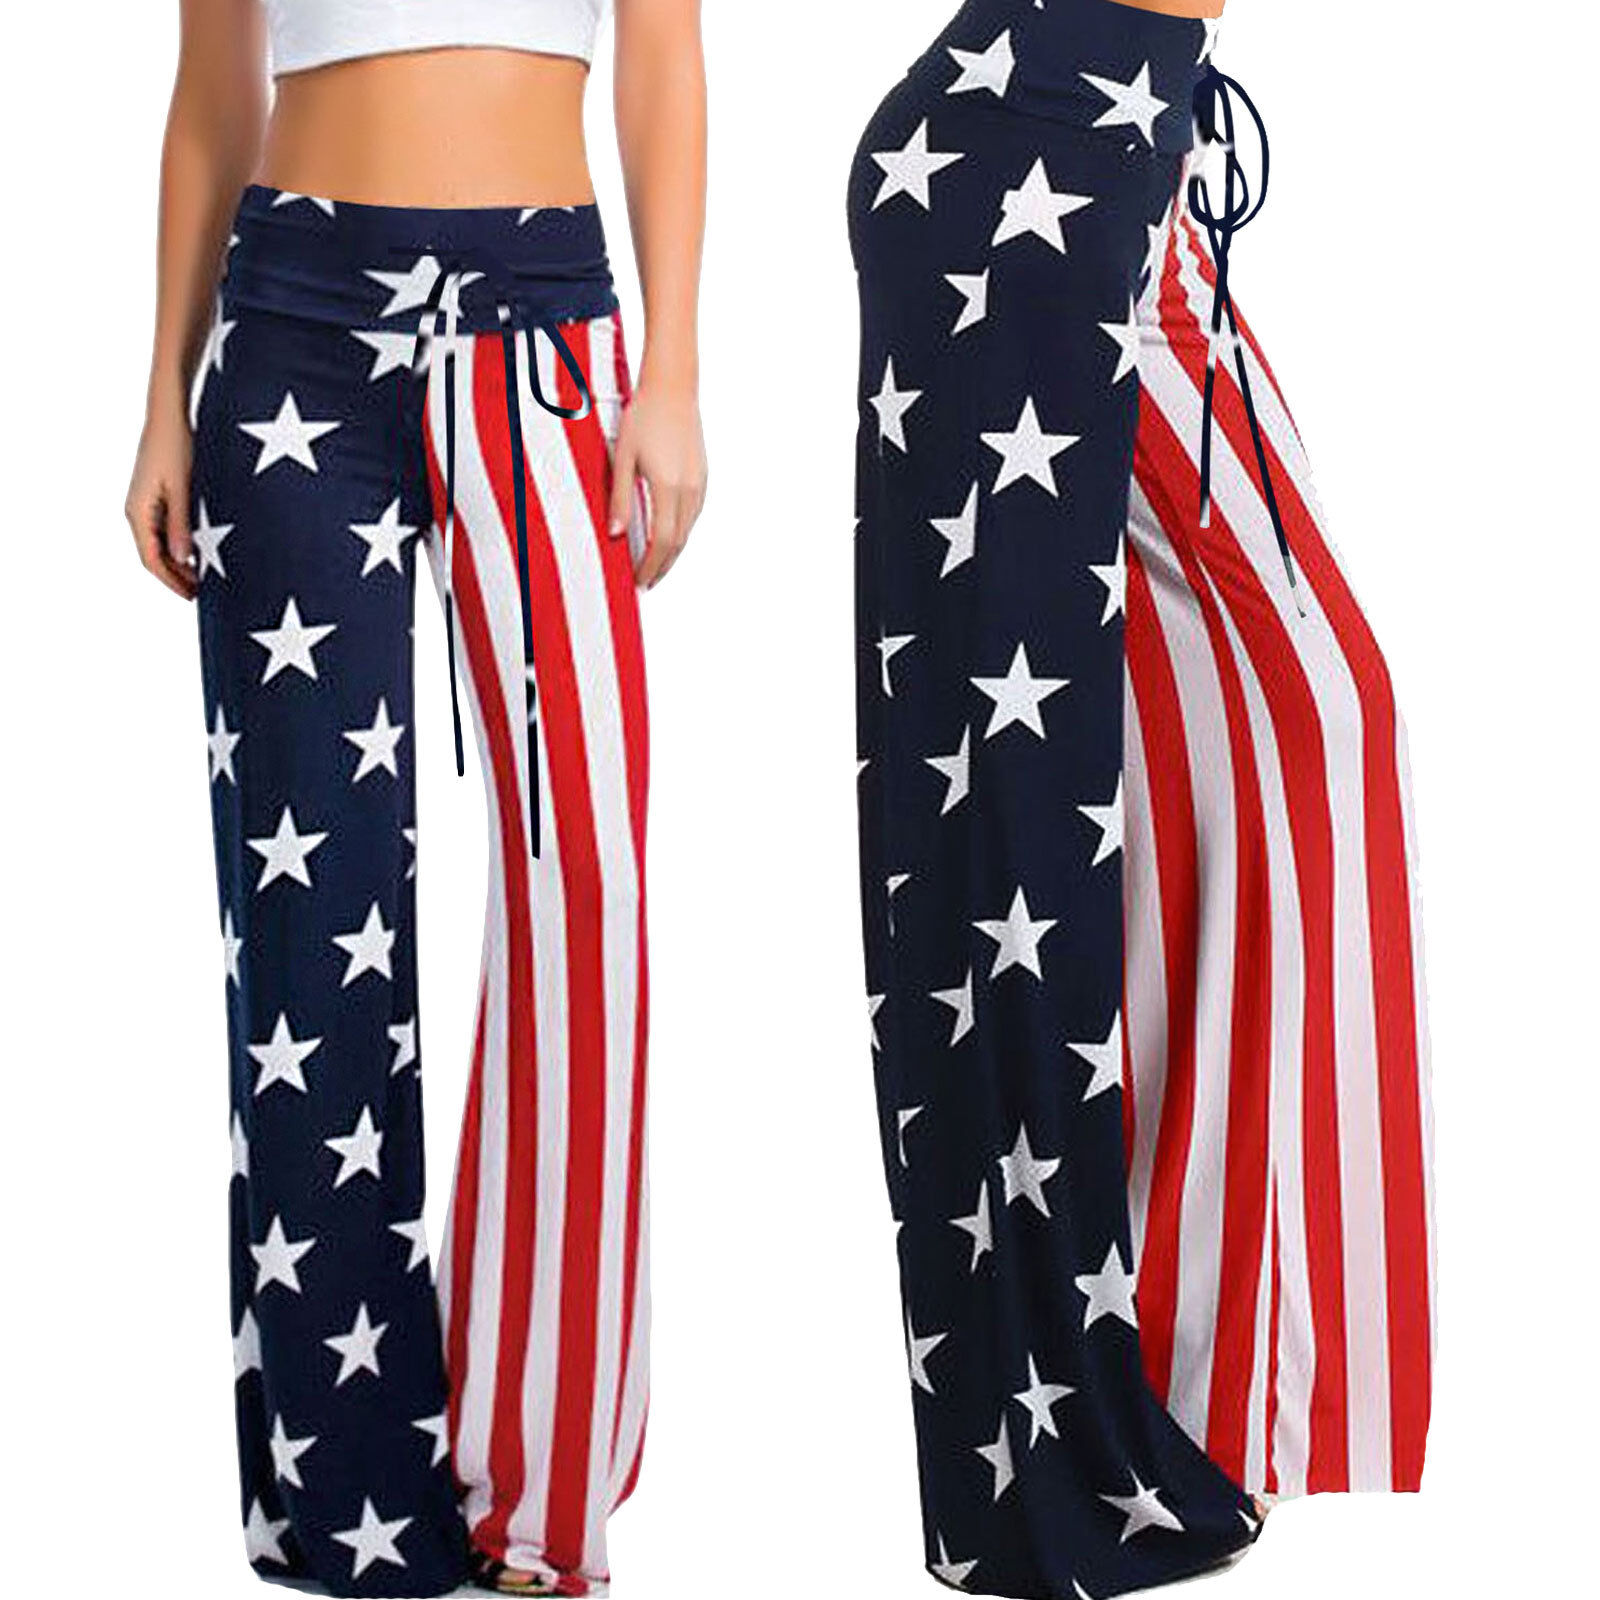 Hose Frau Usa-Flagge Flag Yoga Hose Sport Mehrfarben Sterne DL-2256